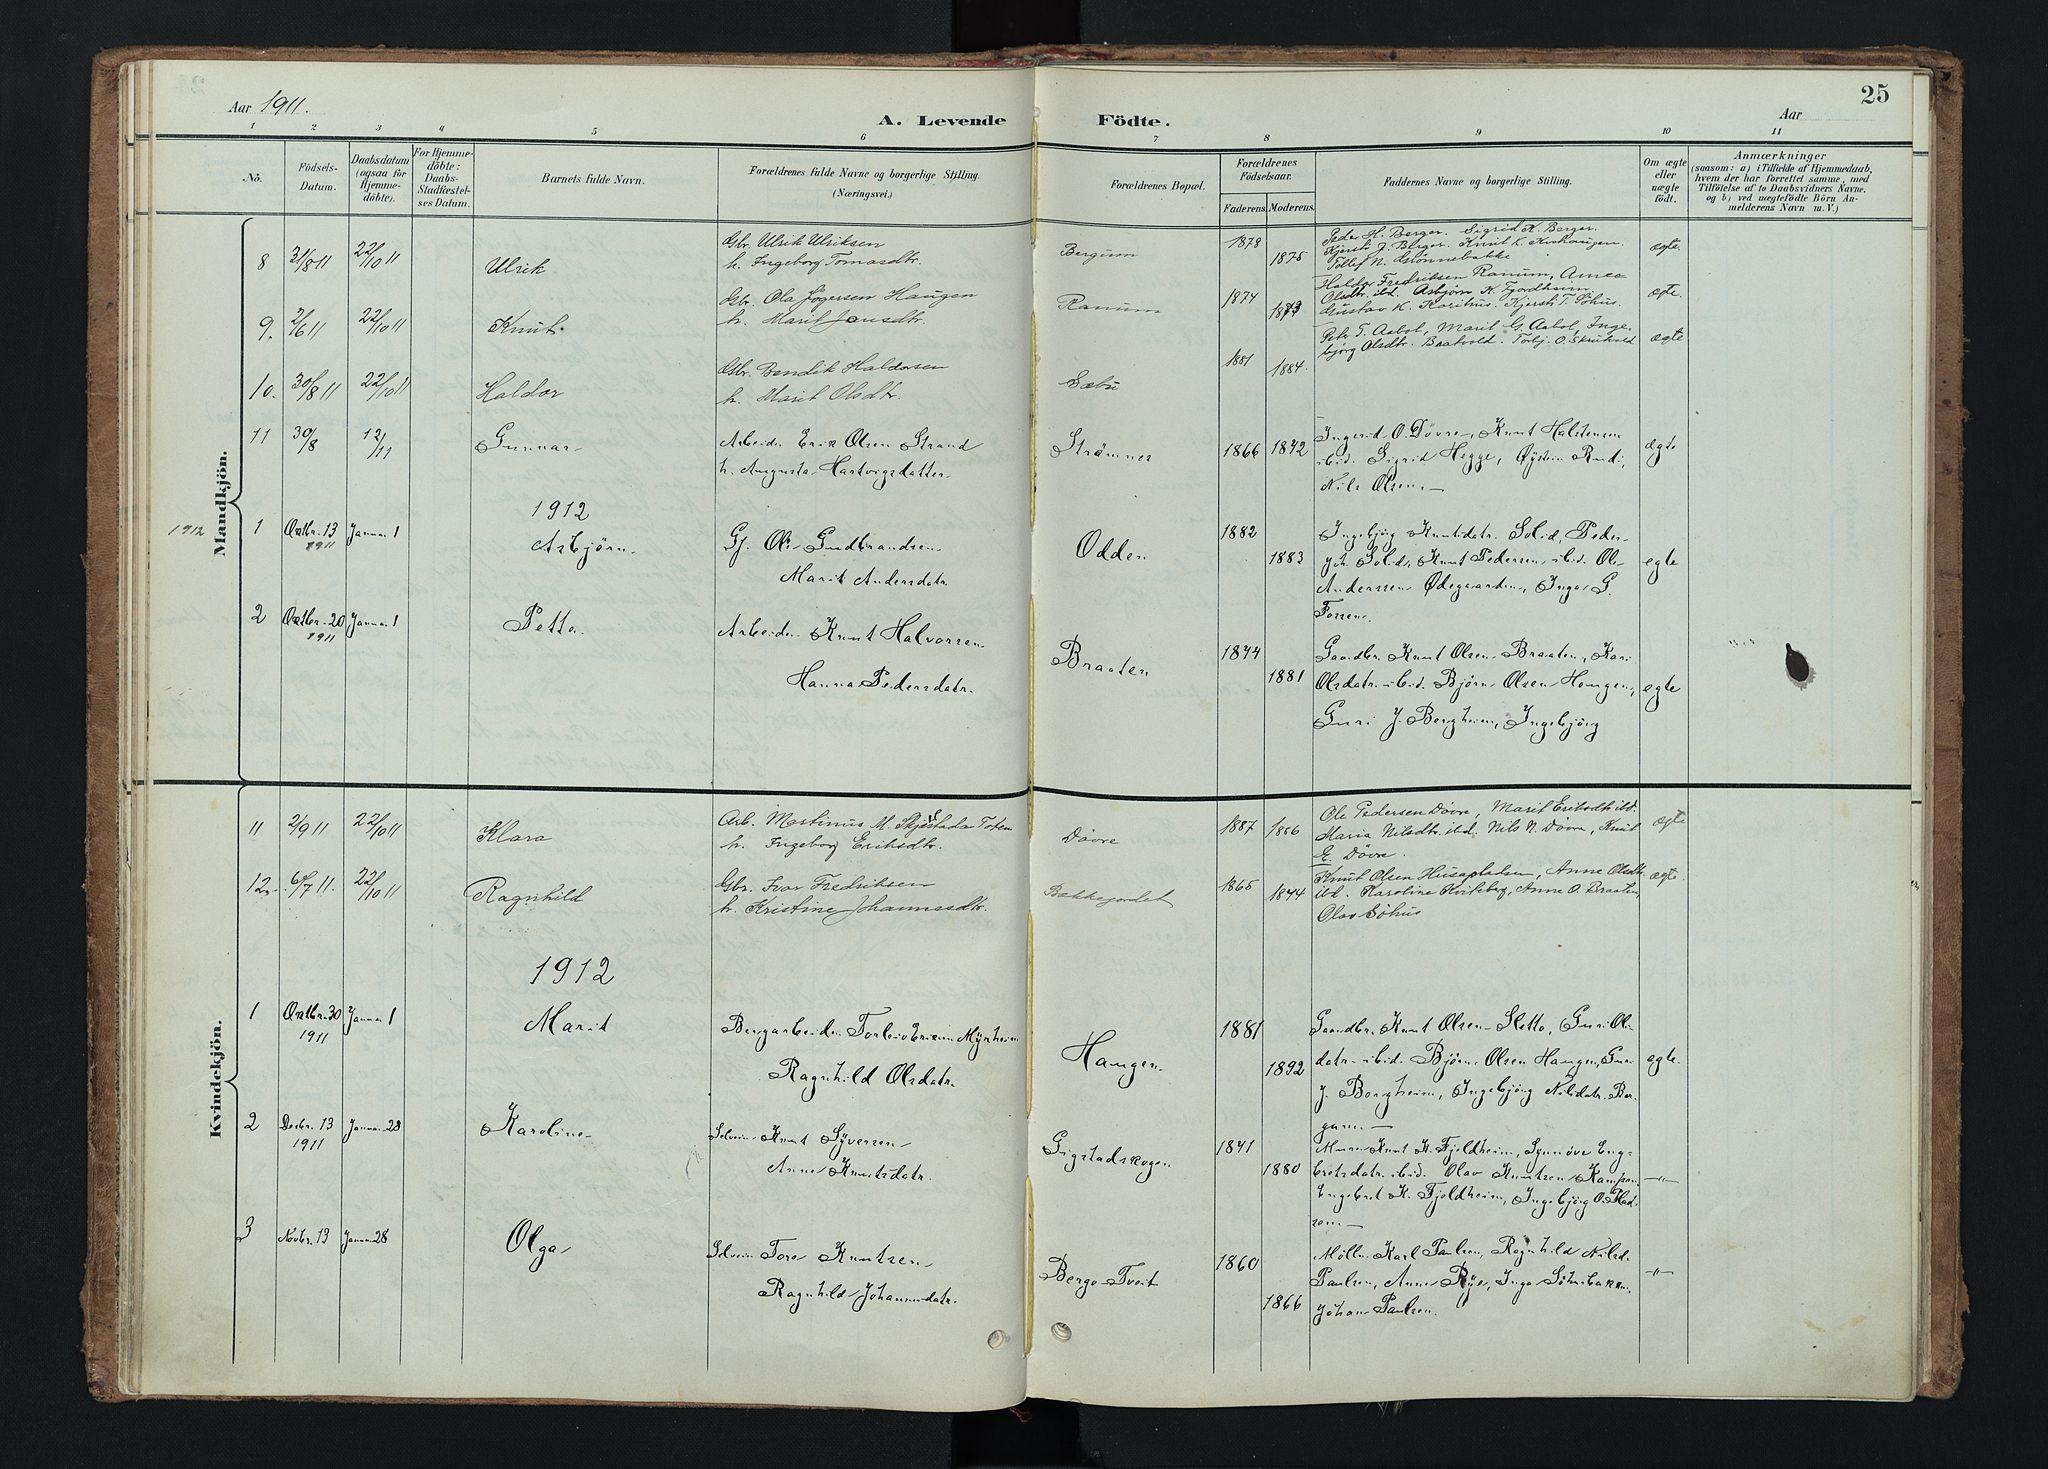 SAH, Nord-Aurdal prestekontor, Ministerialbok nr. 15, 1896-1914, s. 25